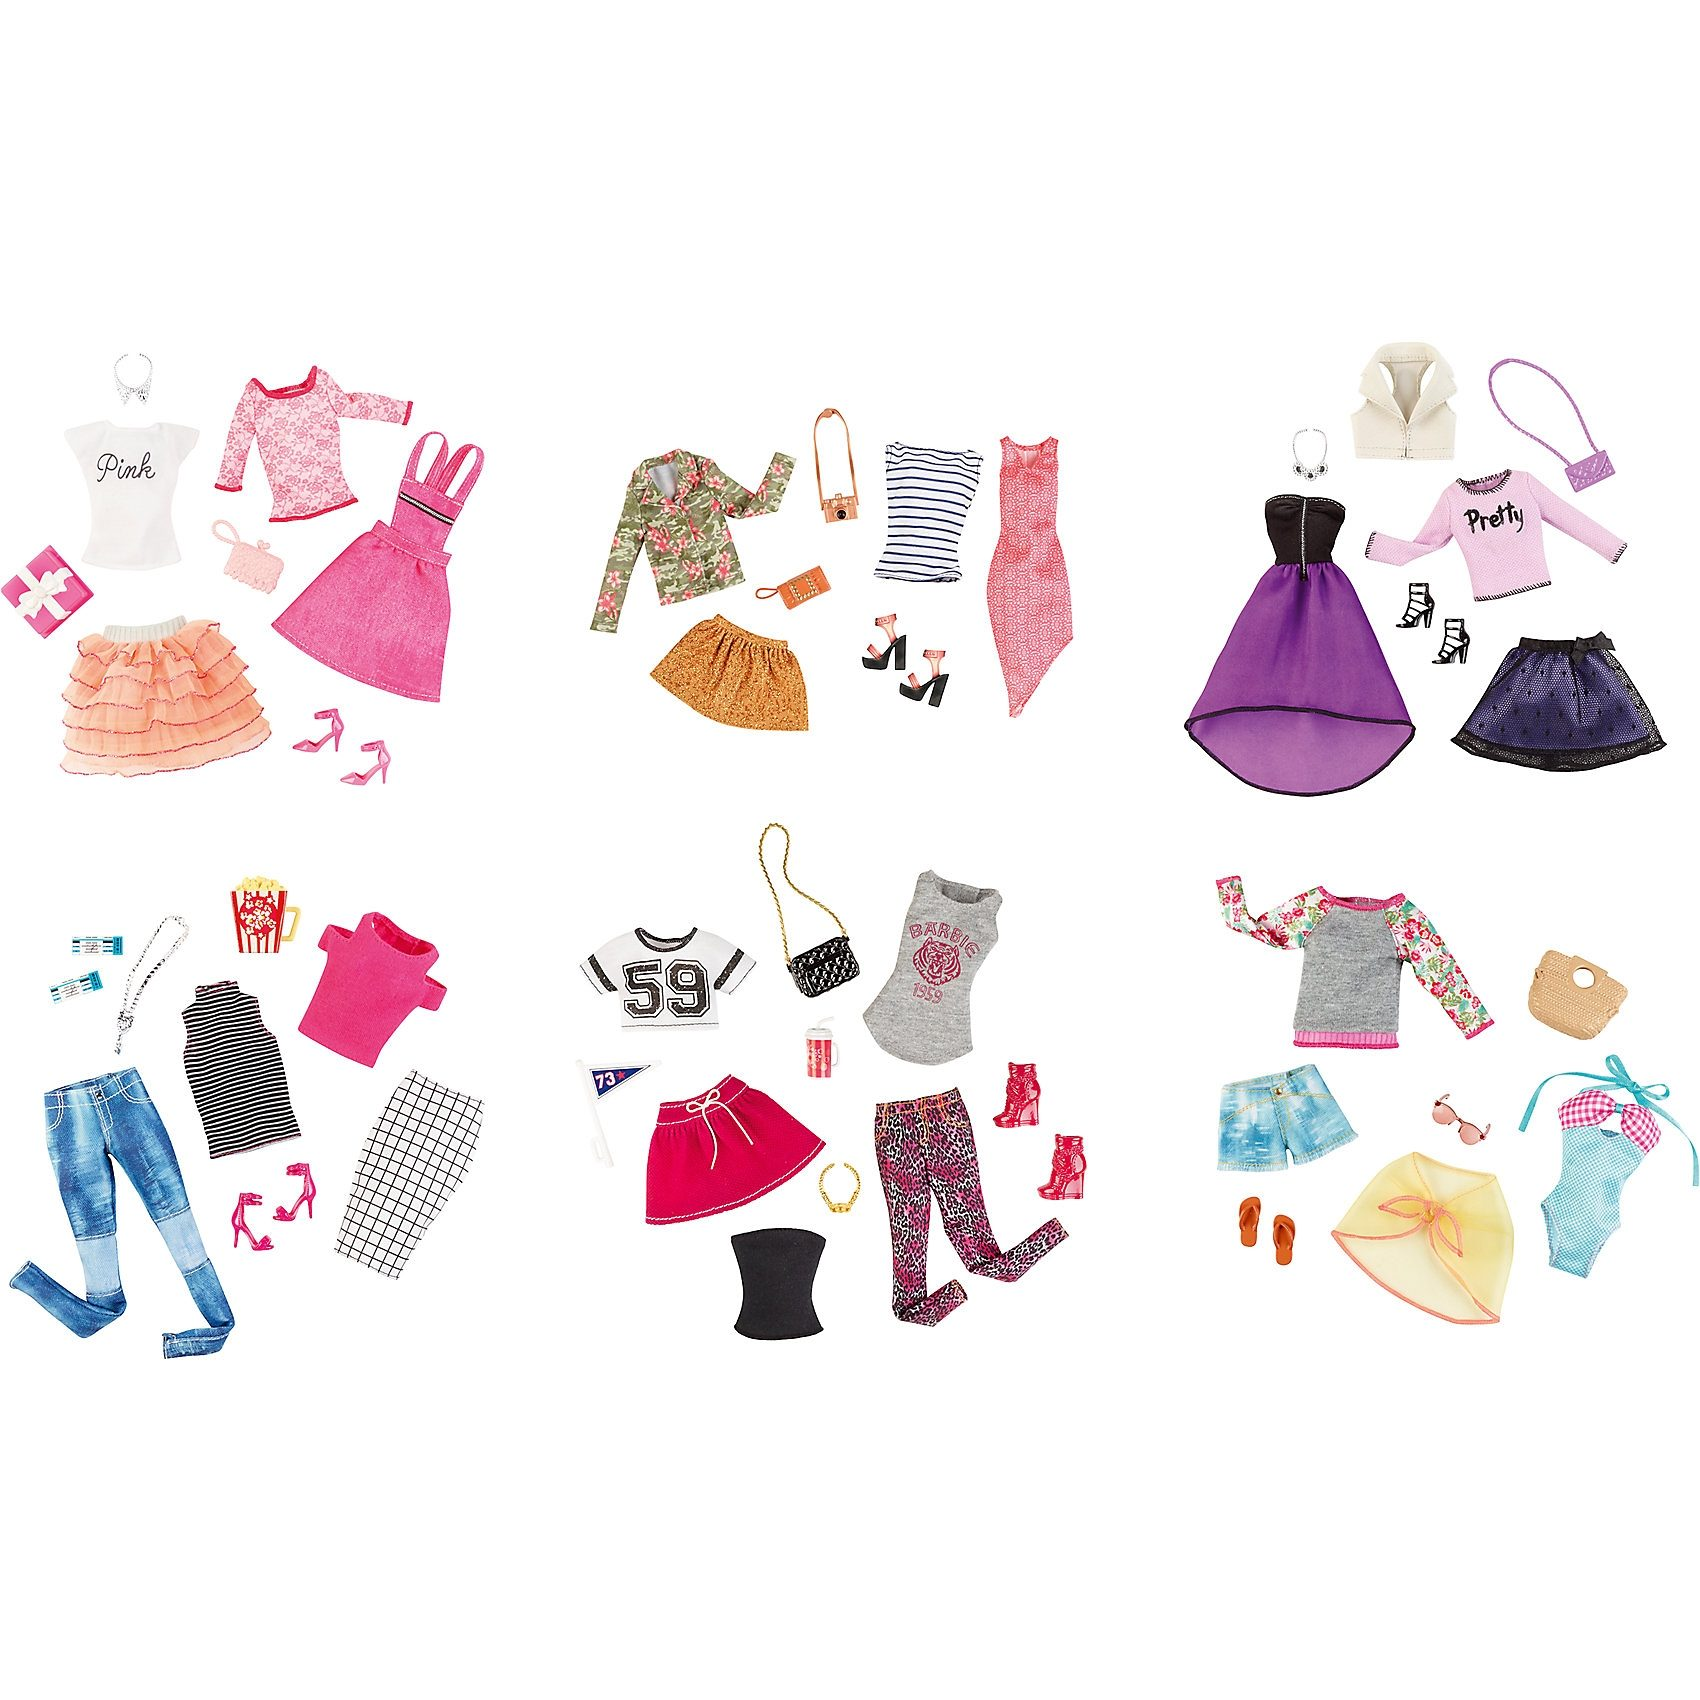 Mattel Mode und Accessoires 2er-Pack. (1 Set)